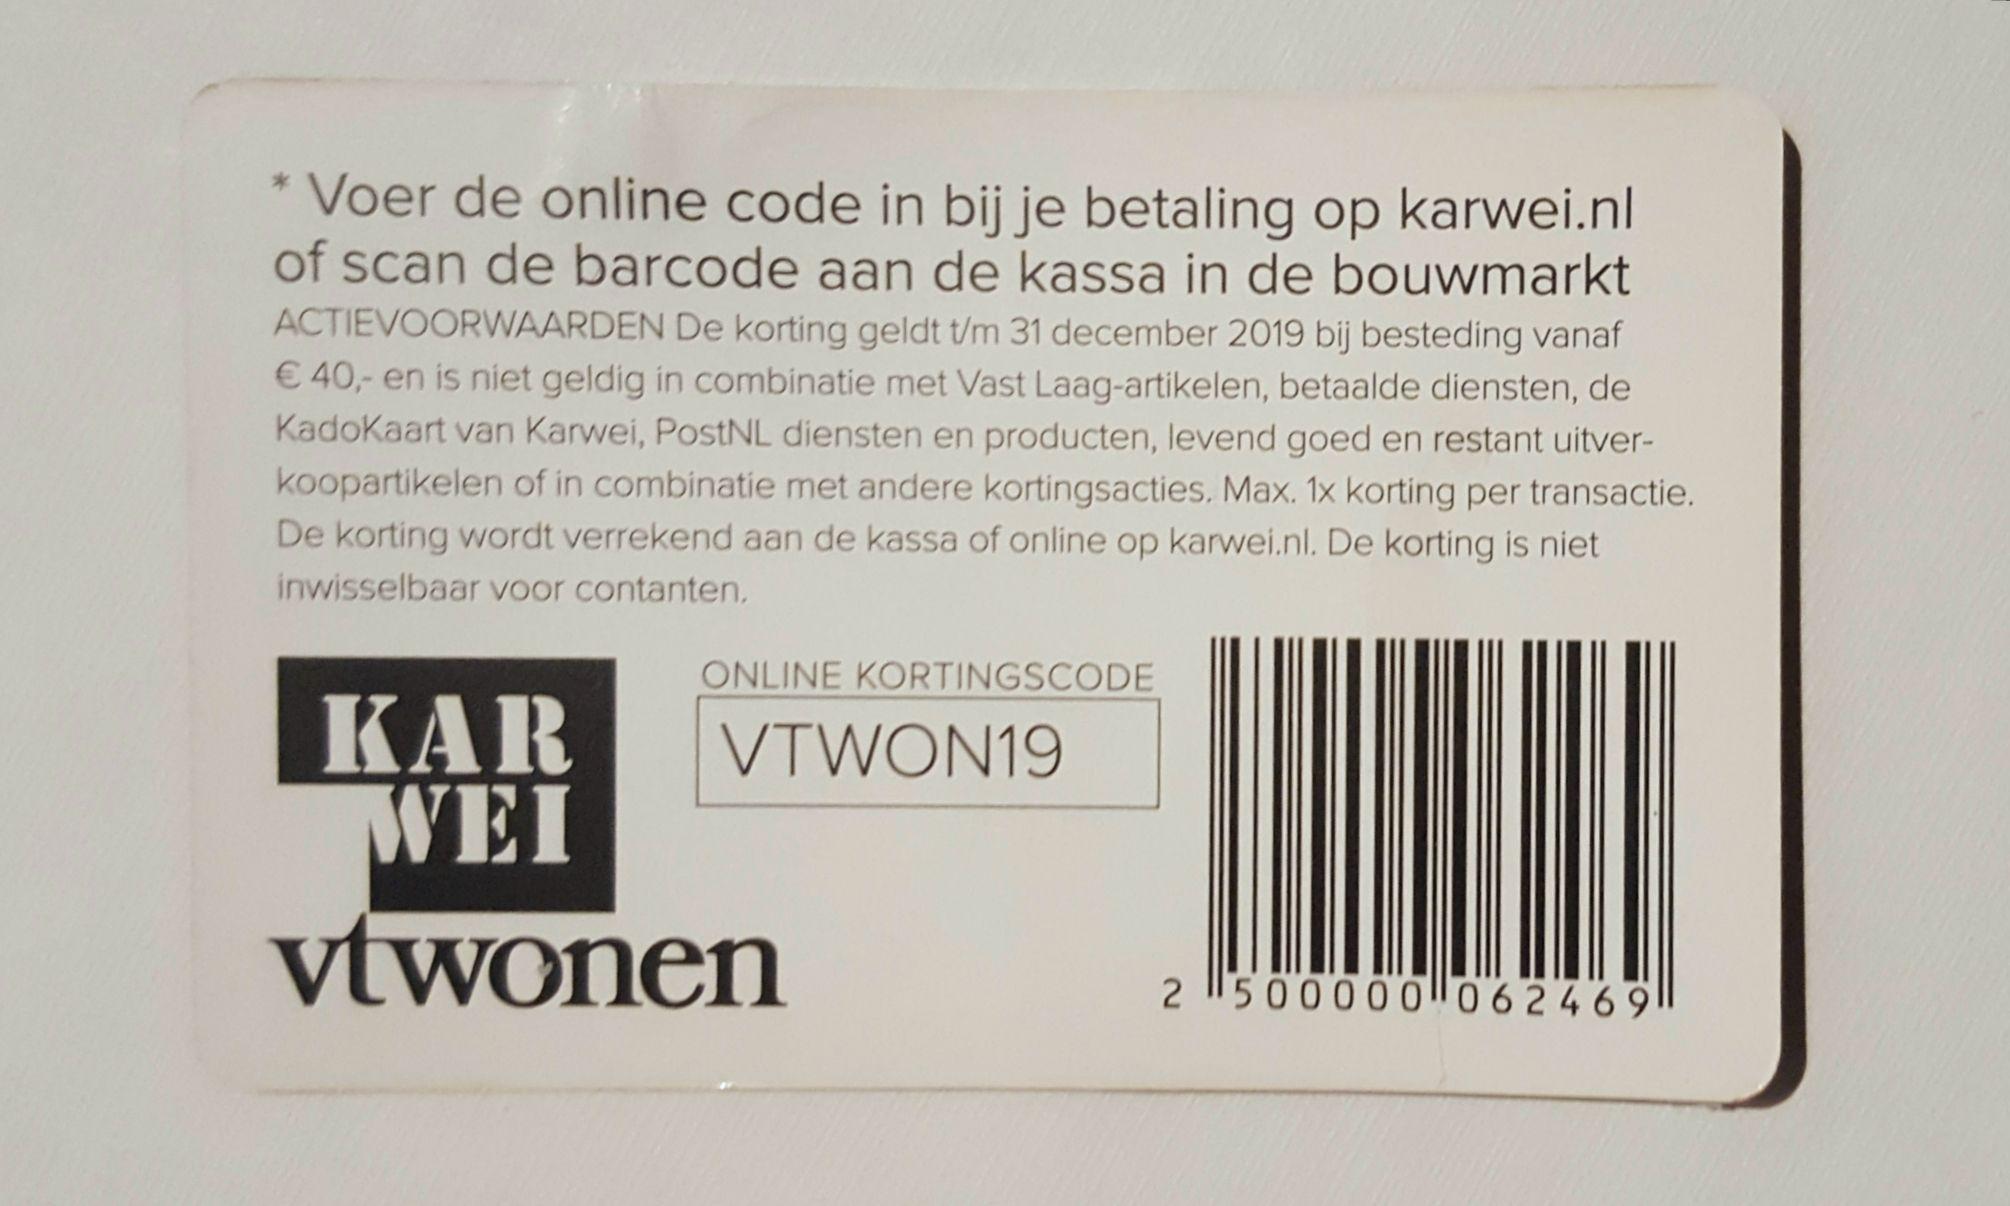 Karwei € 10,- korting bij besteding vanaf € 40,-